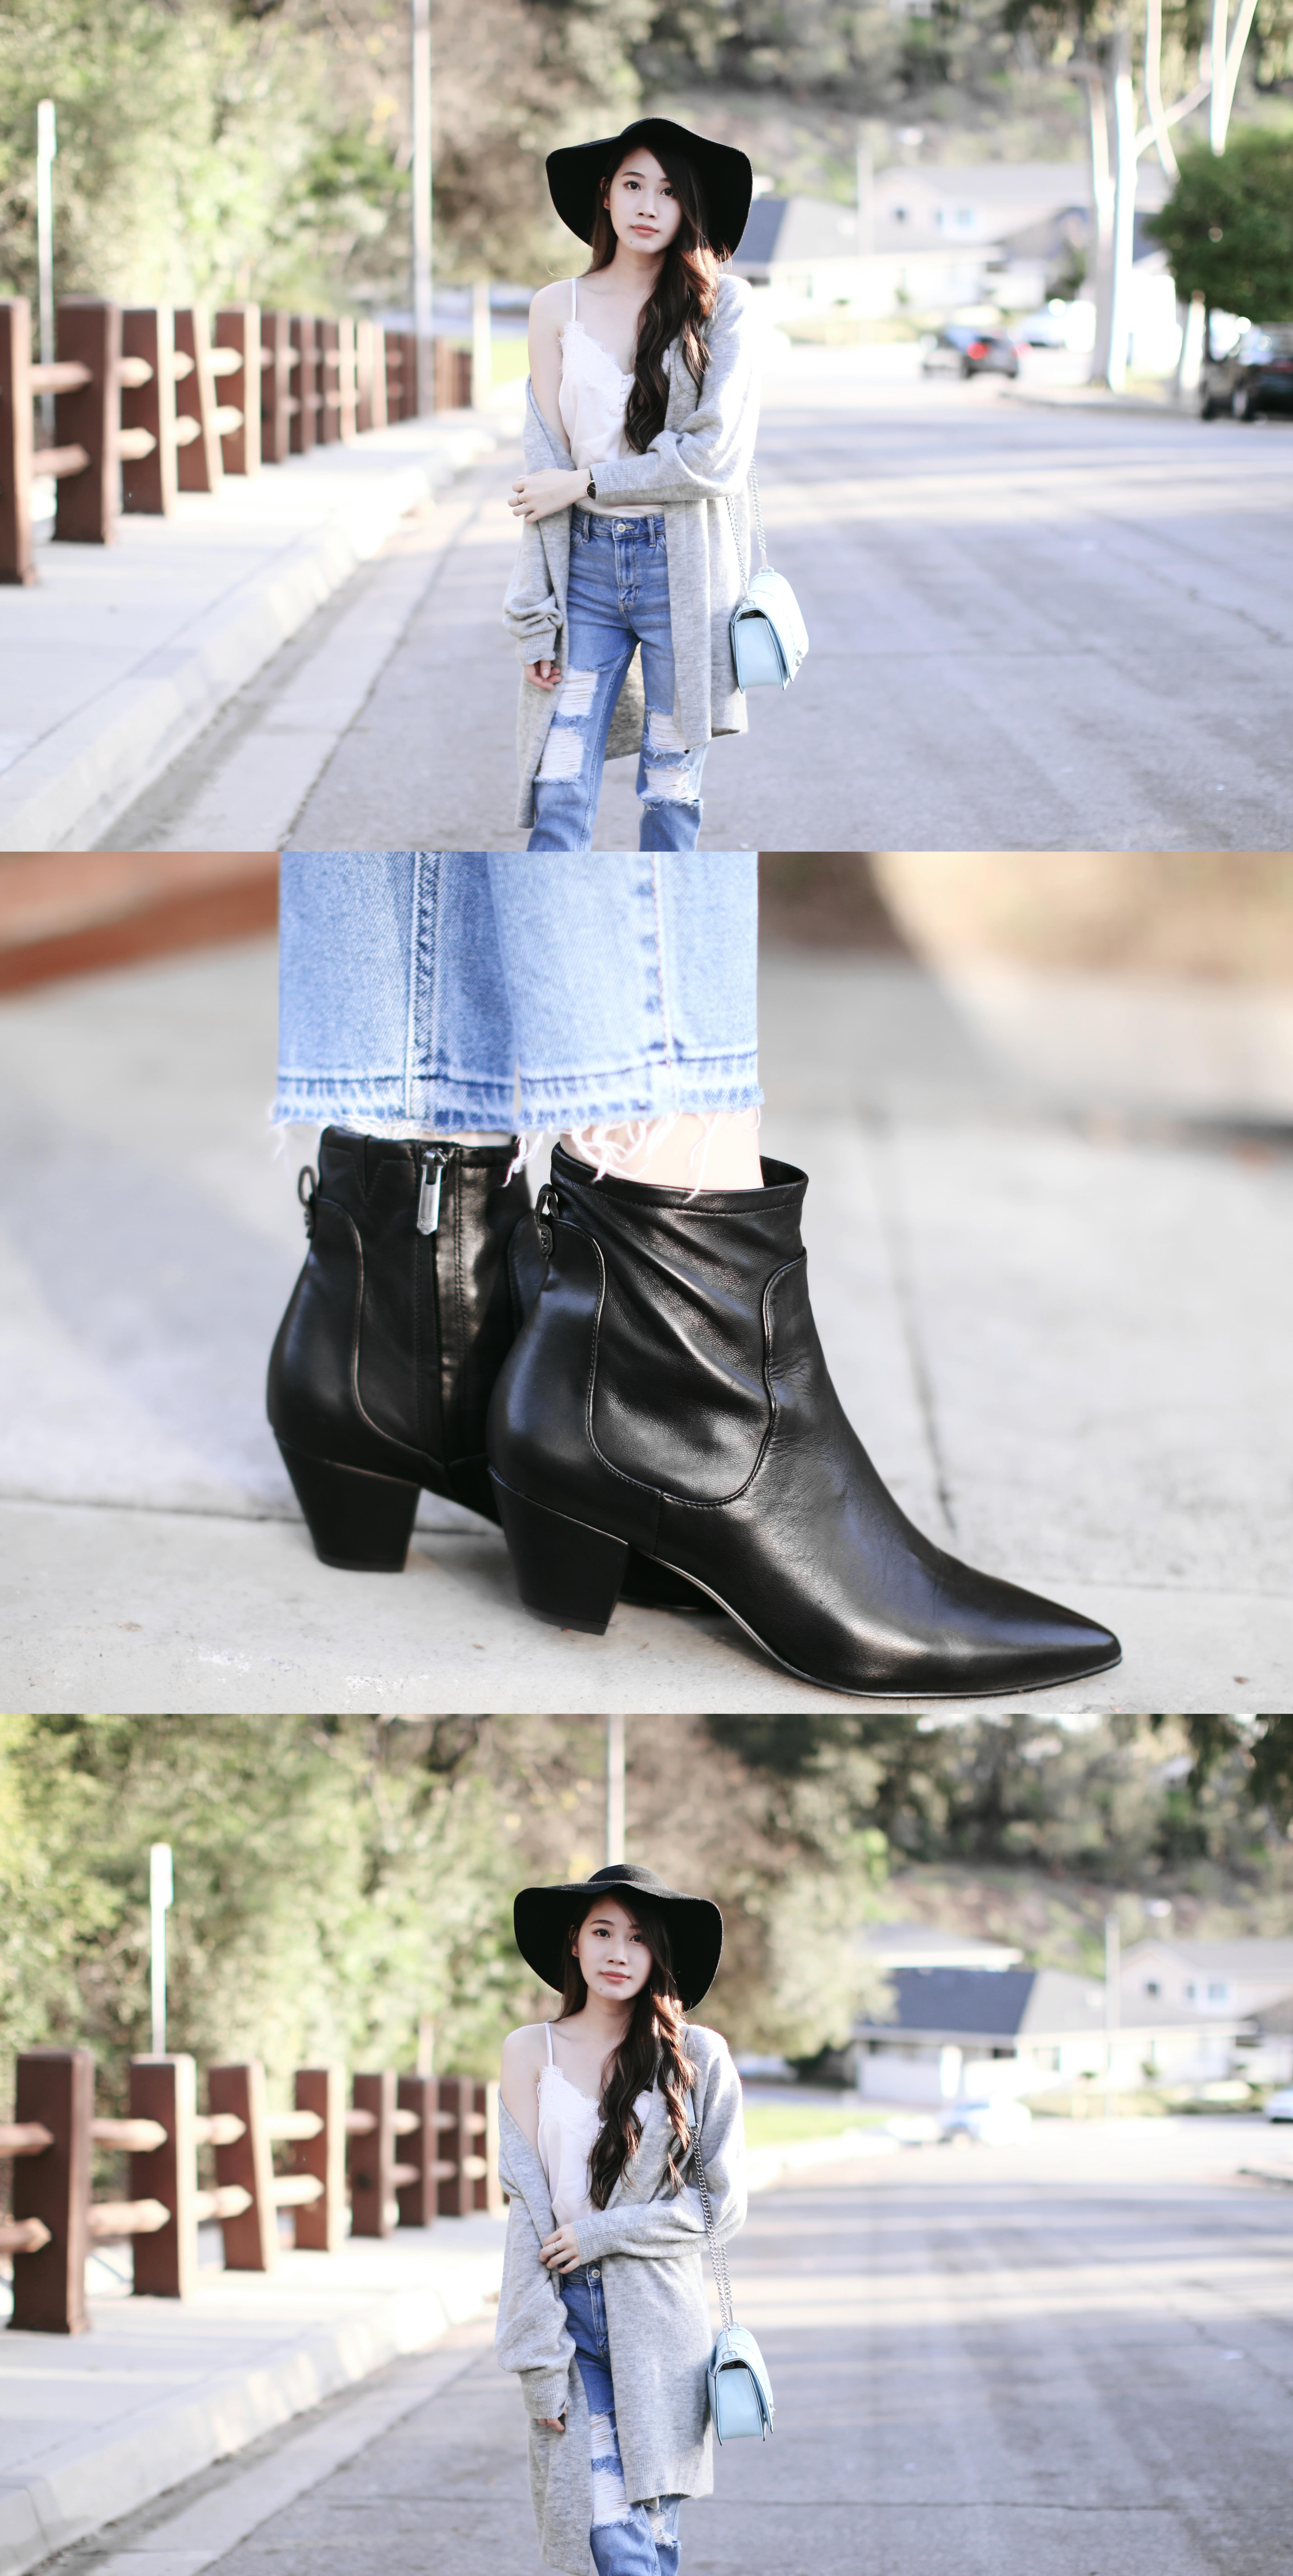 2-ootd-wiwt-fashion-fblogger-lablogger-winterfashion-samedelmanitselizabethtran-clothestoyouuu